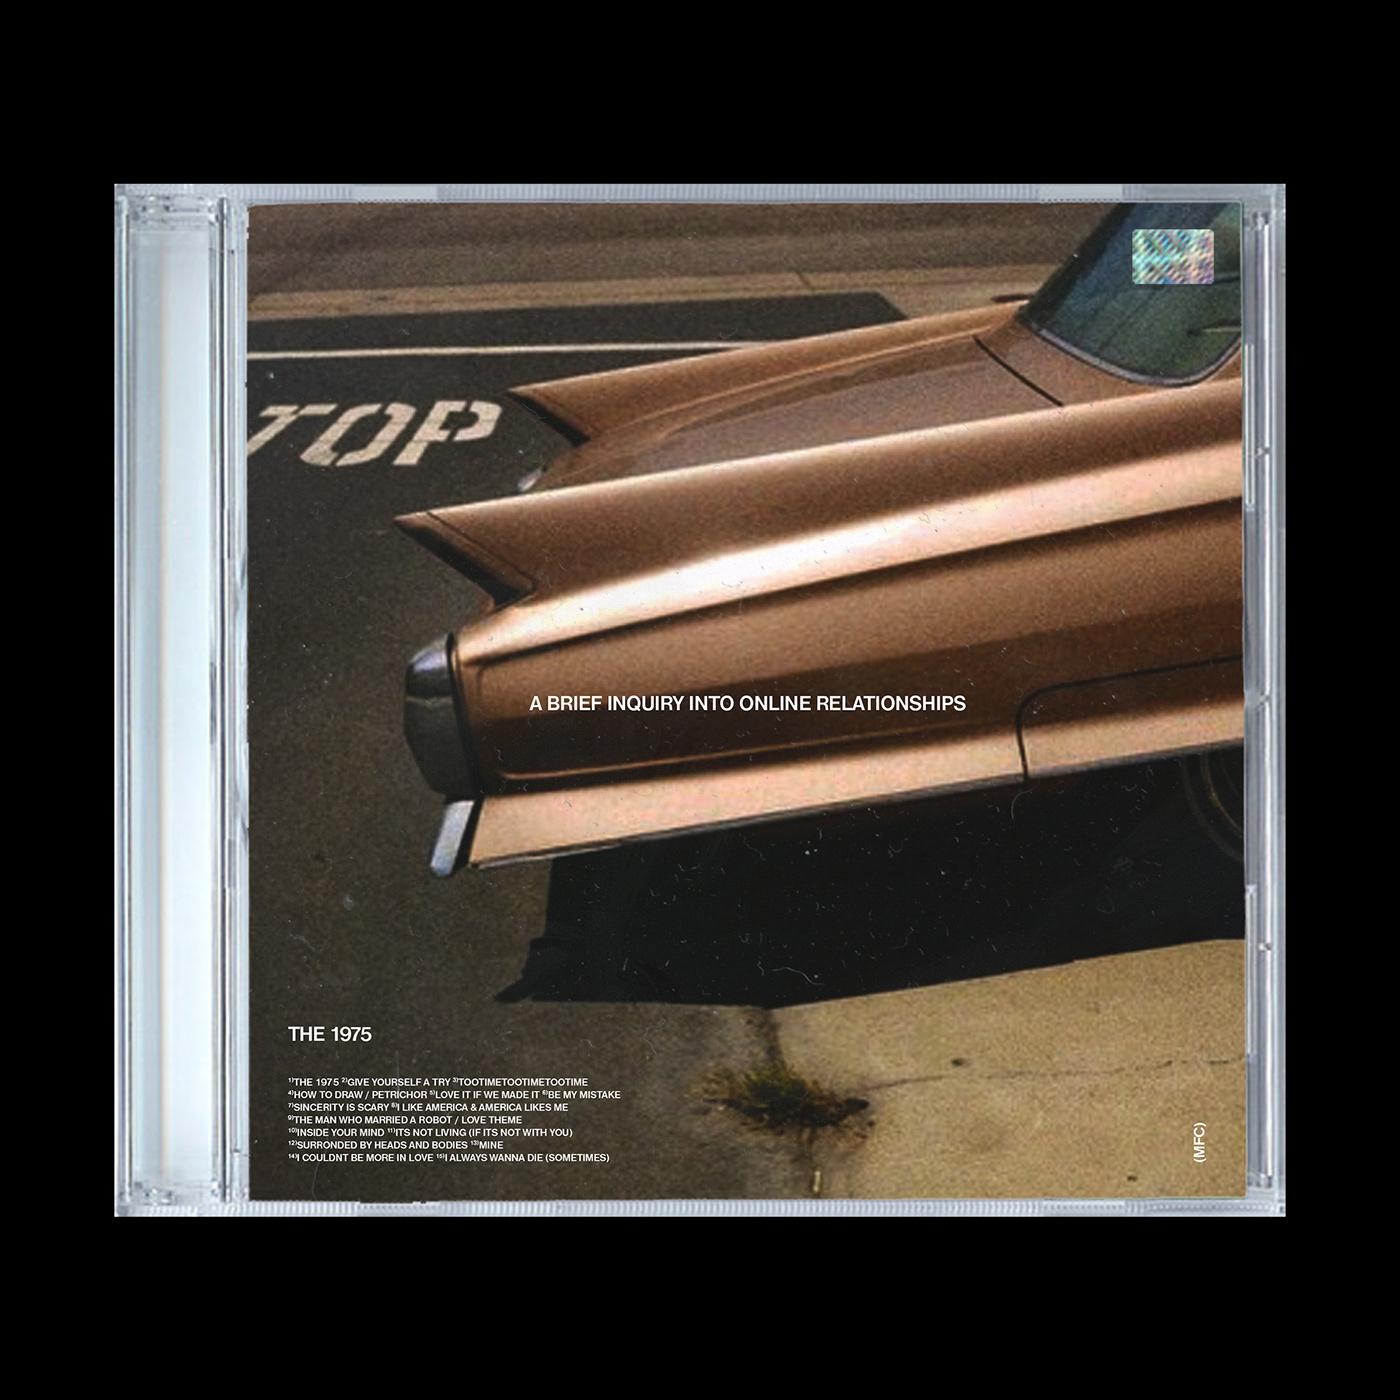 Album Covers Vol7 On Behance